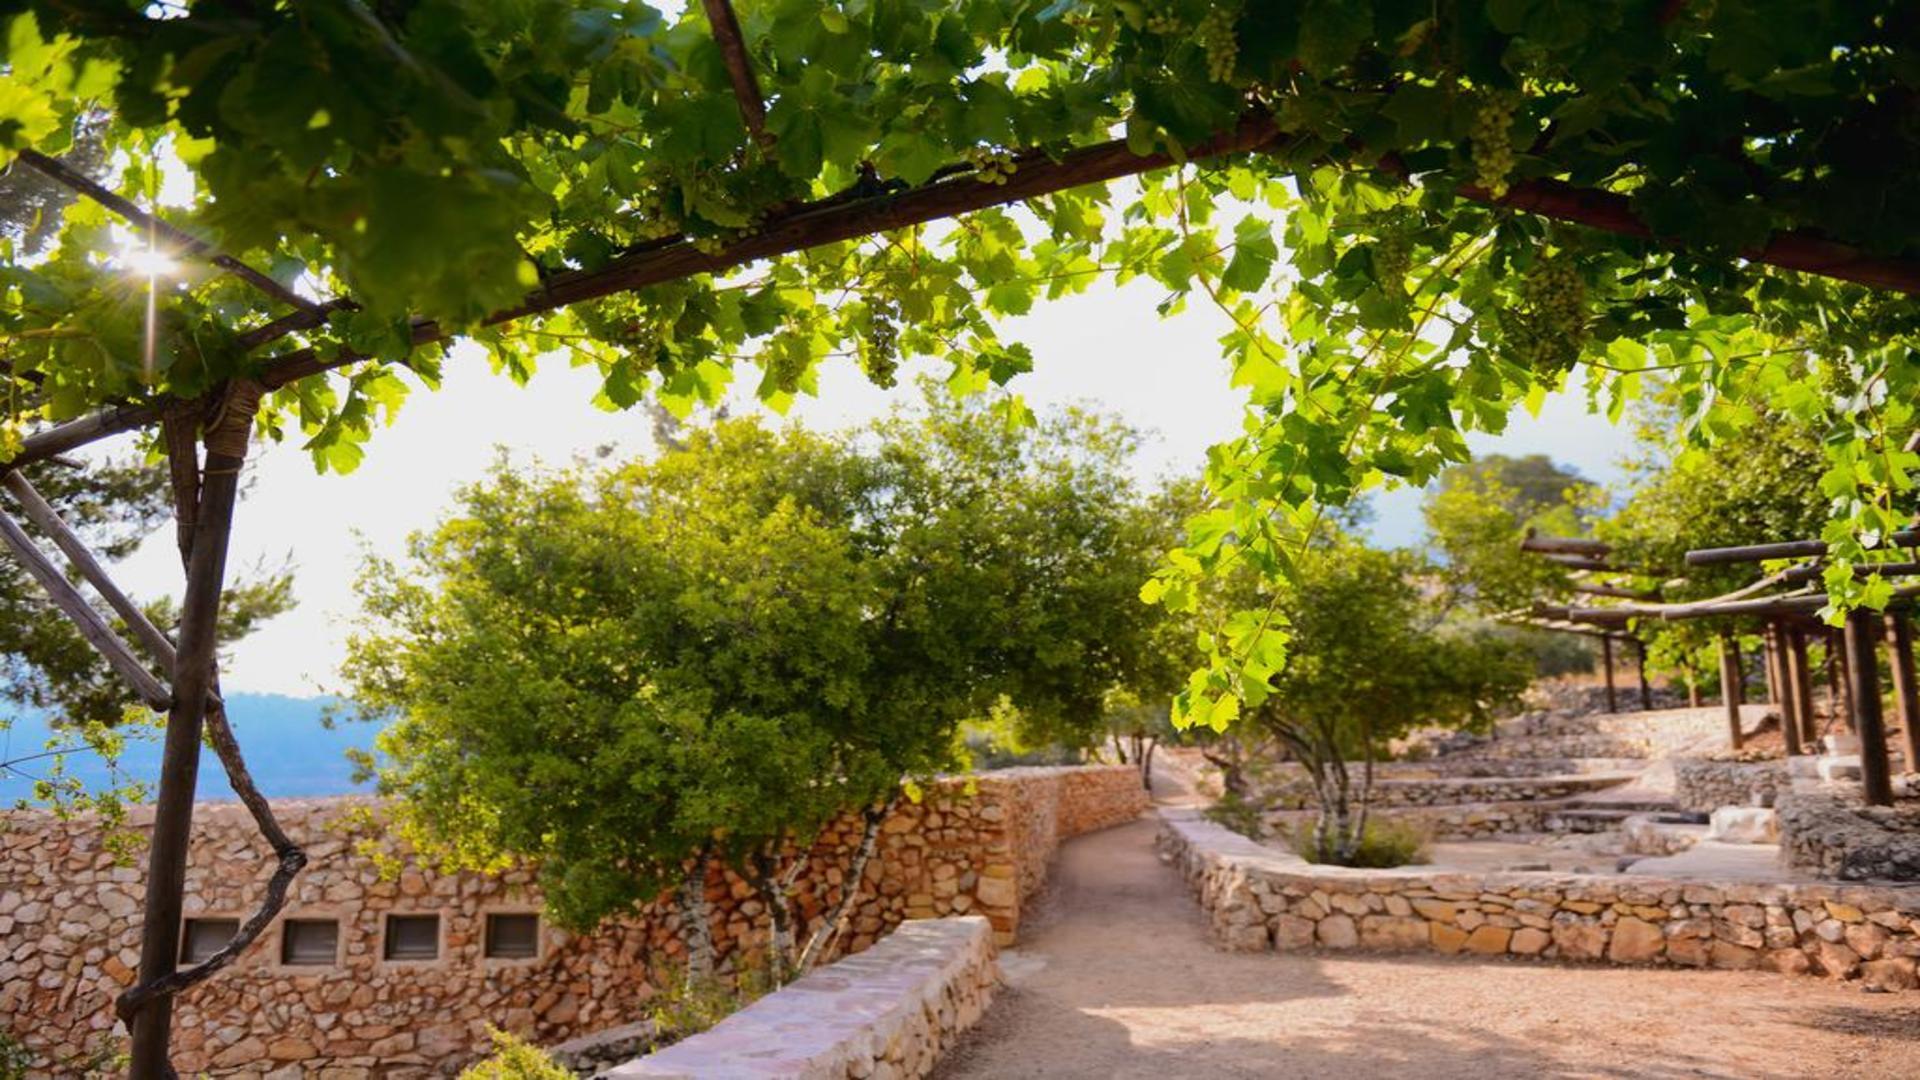 Mooie begroeiing bij Kibboets Yad Hasmona, regio Jeruzalem, Israël